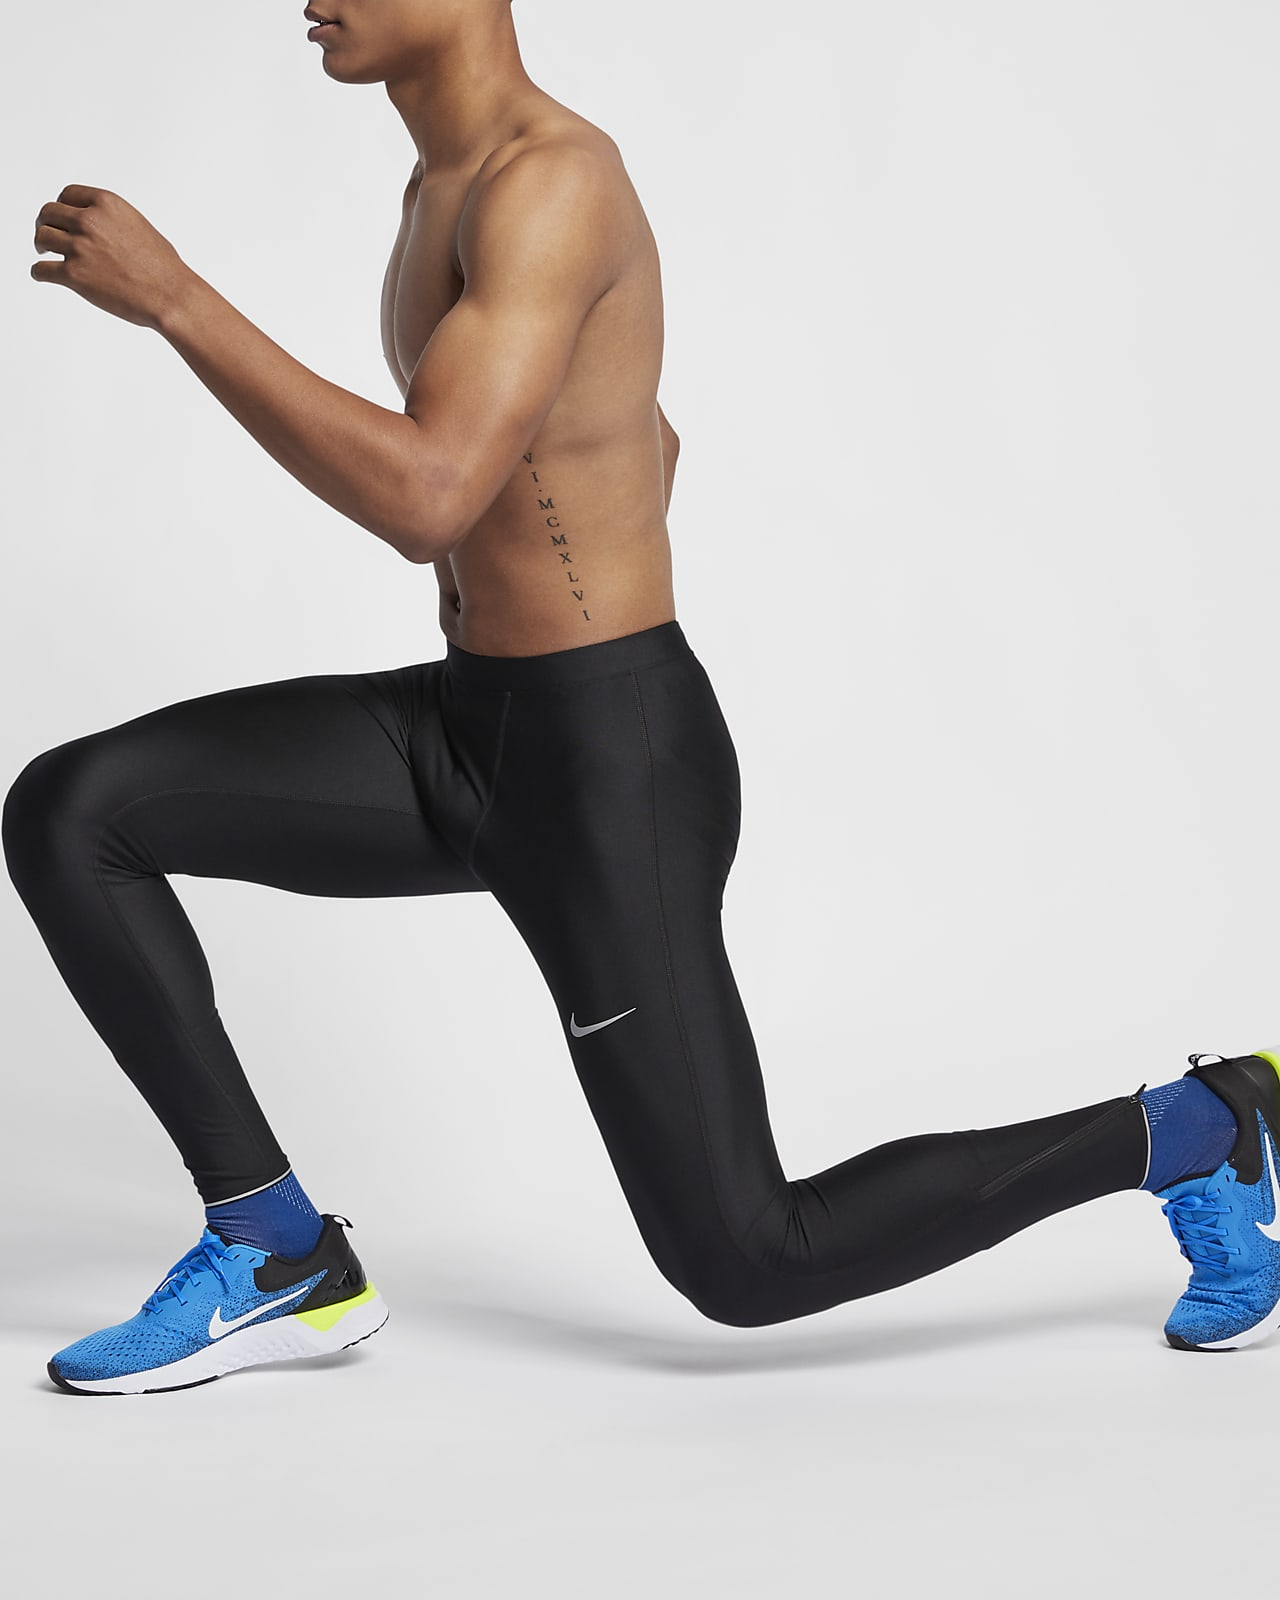 Nike Men's Running Tights. Nike.com